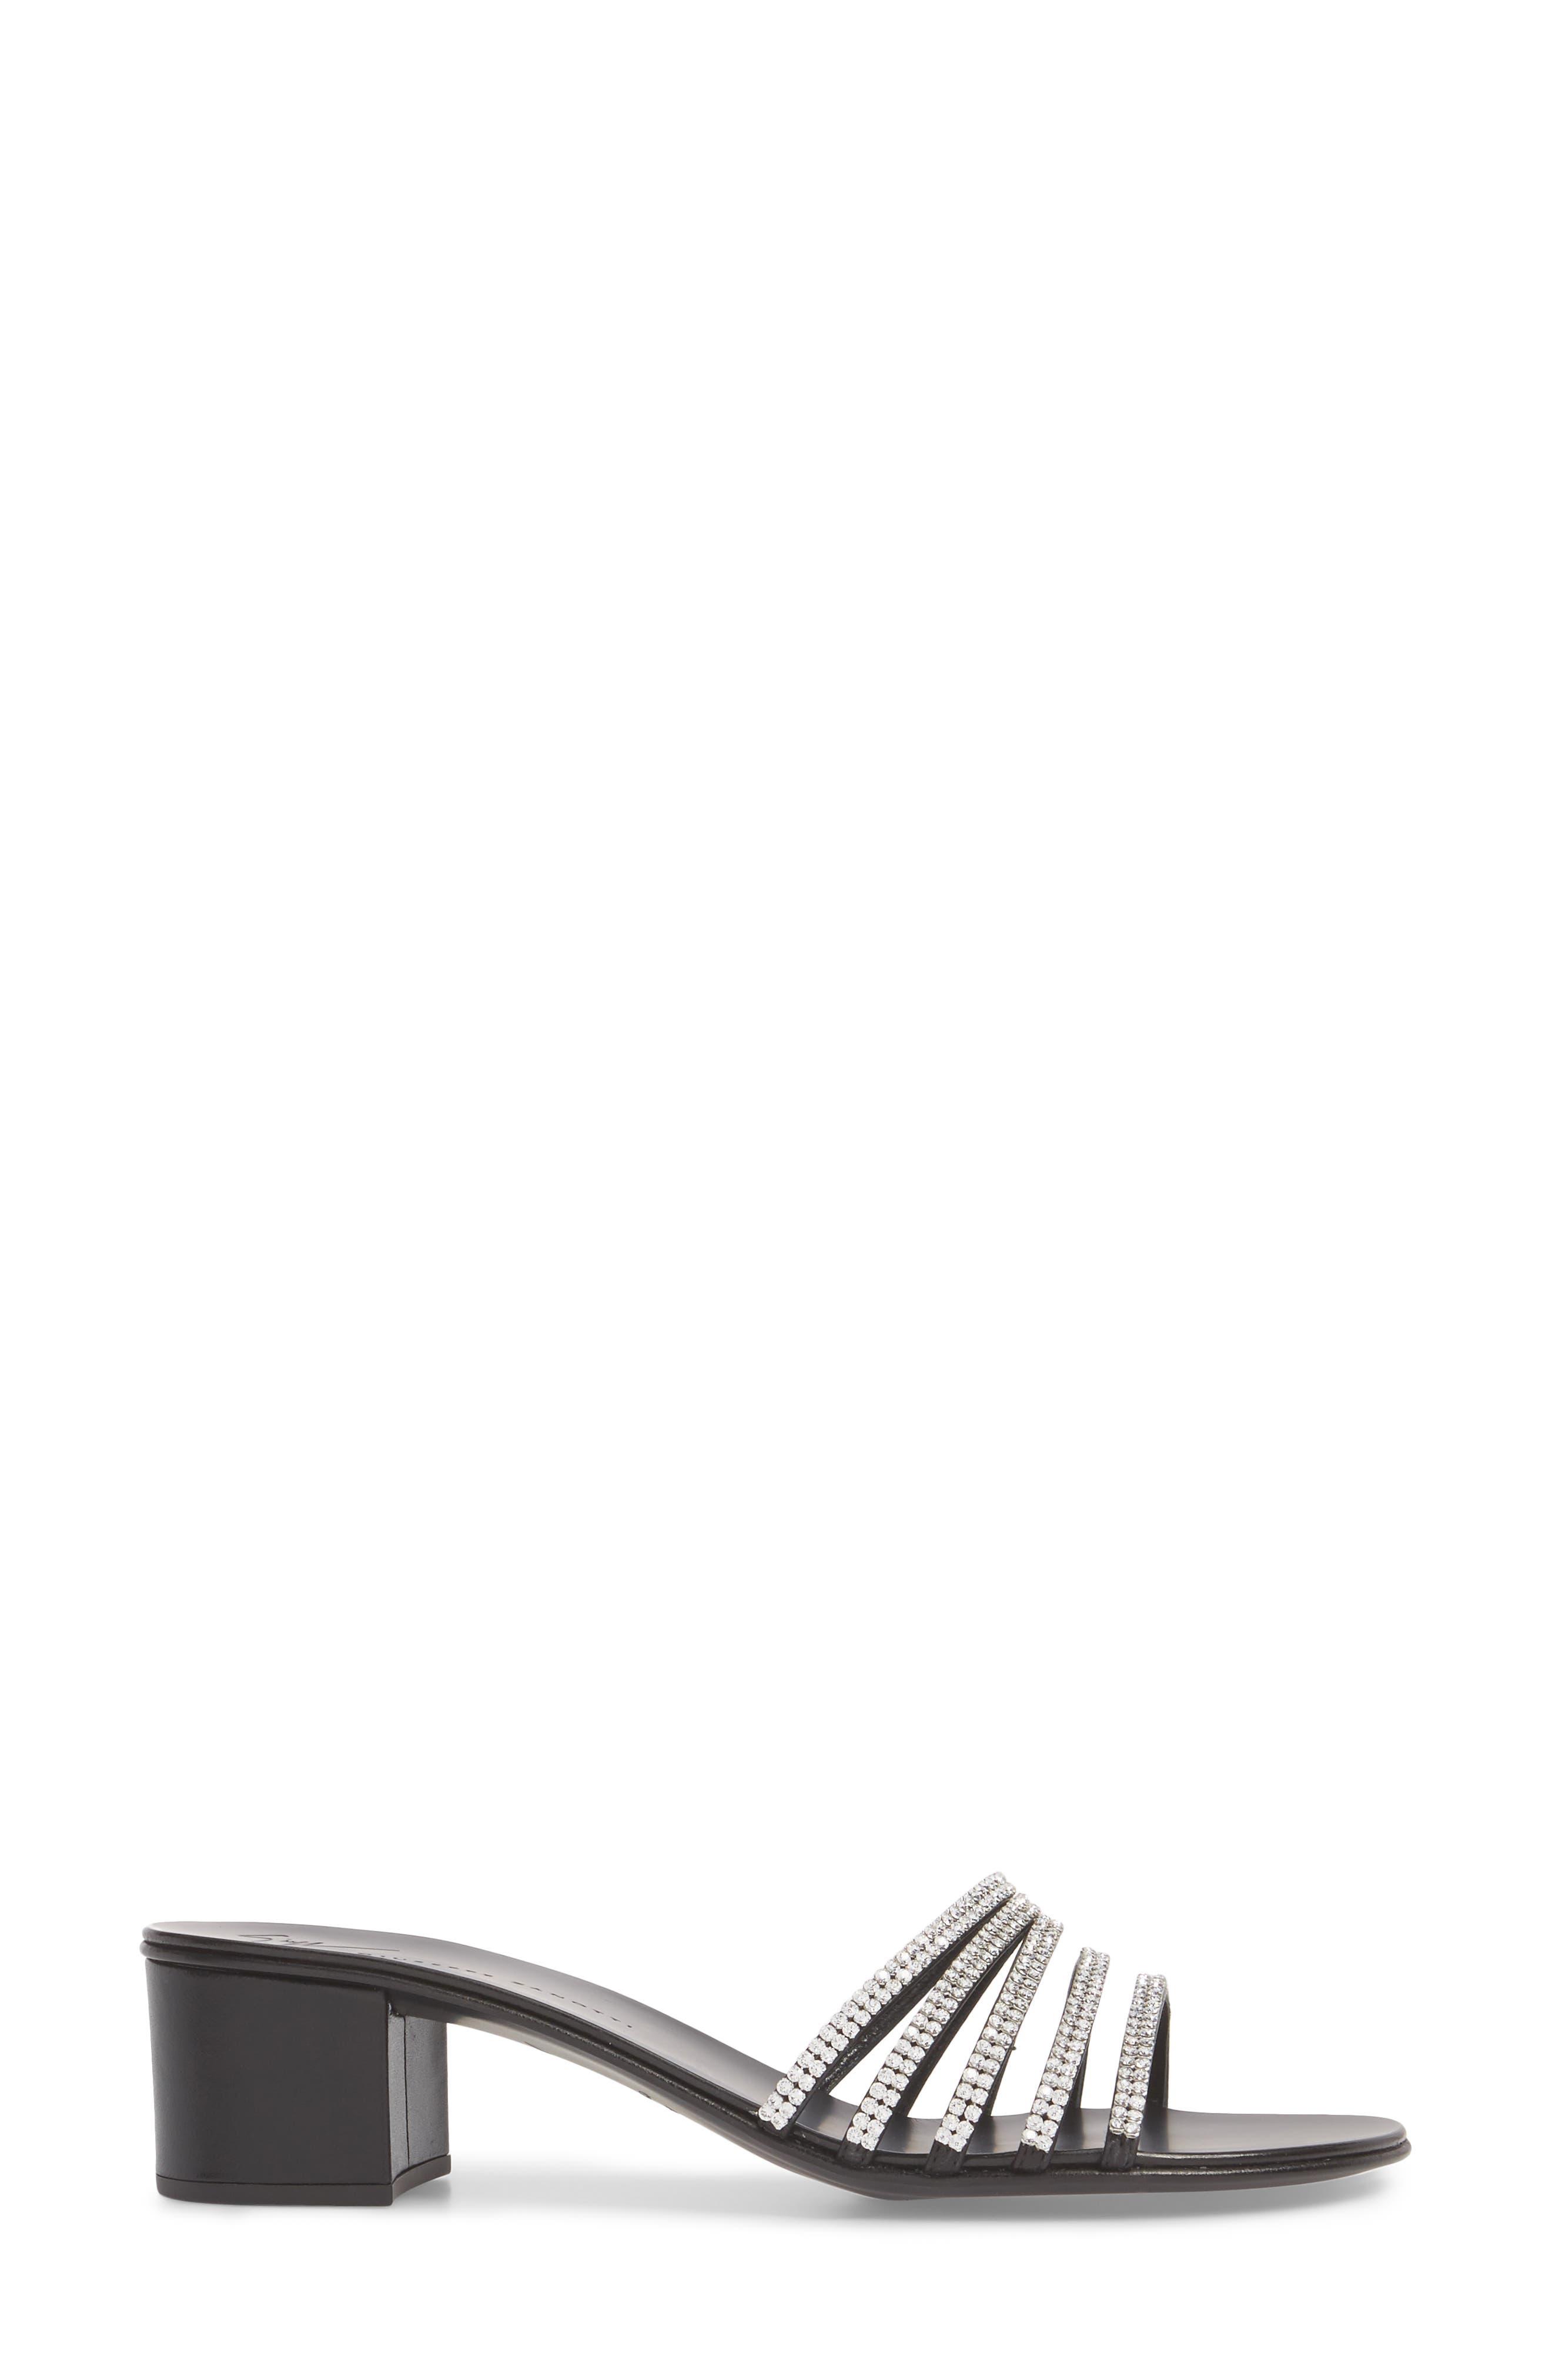 Swarovski Crystal Slide Sandal,                             Alternate thumbnail 3, color,                             BLACK